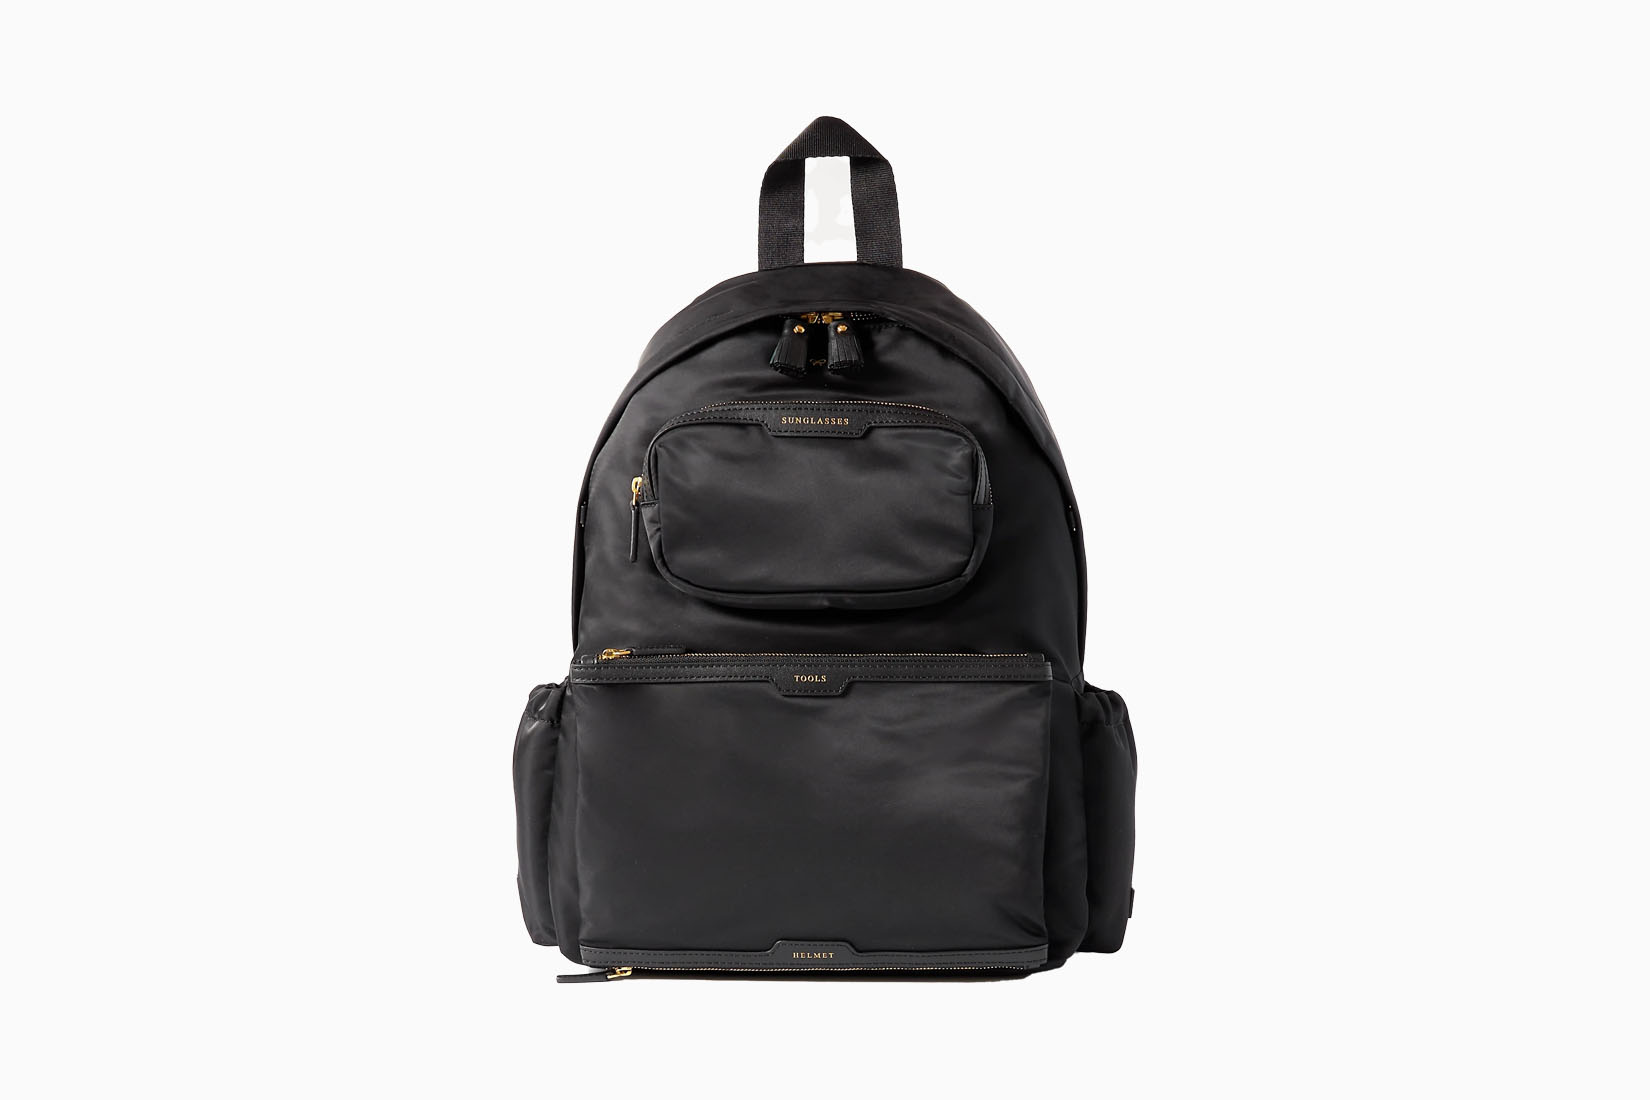 best backpacks women anya hindmarch review Luxe Digital